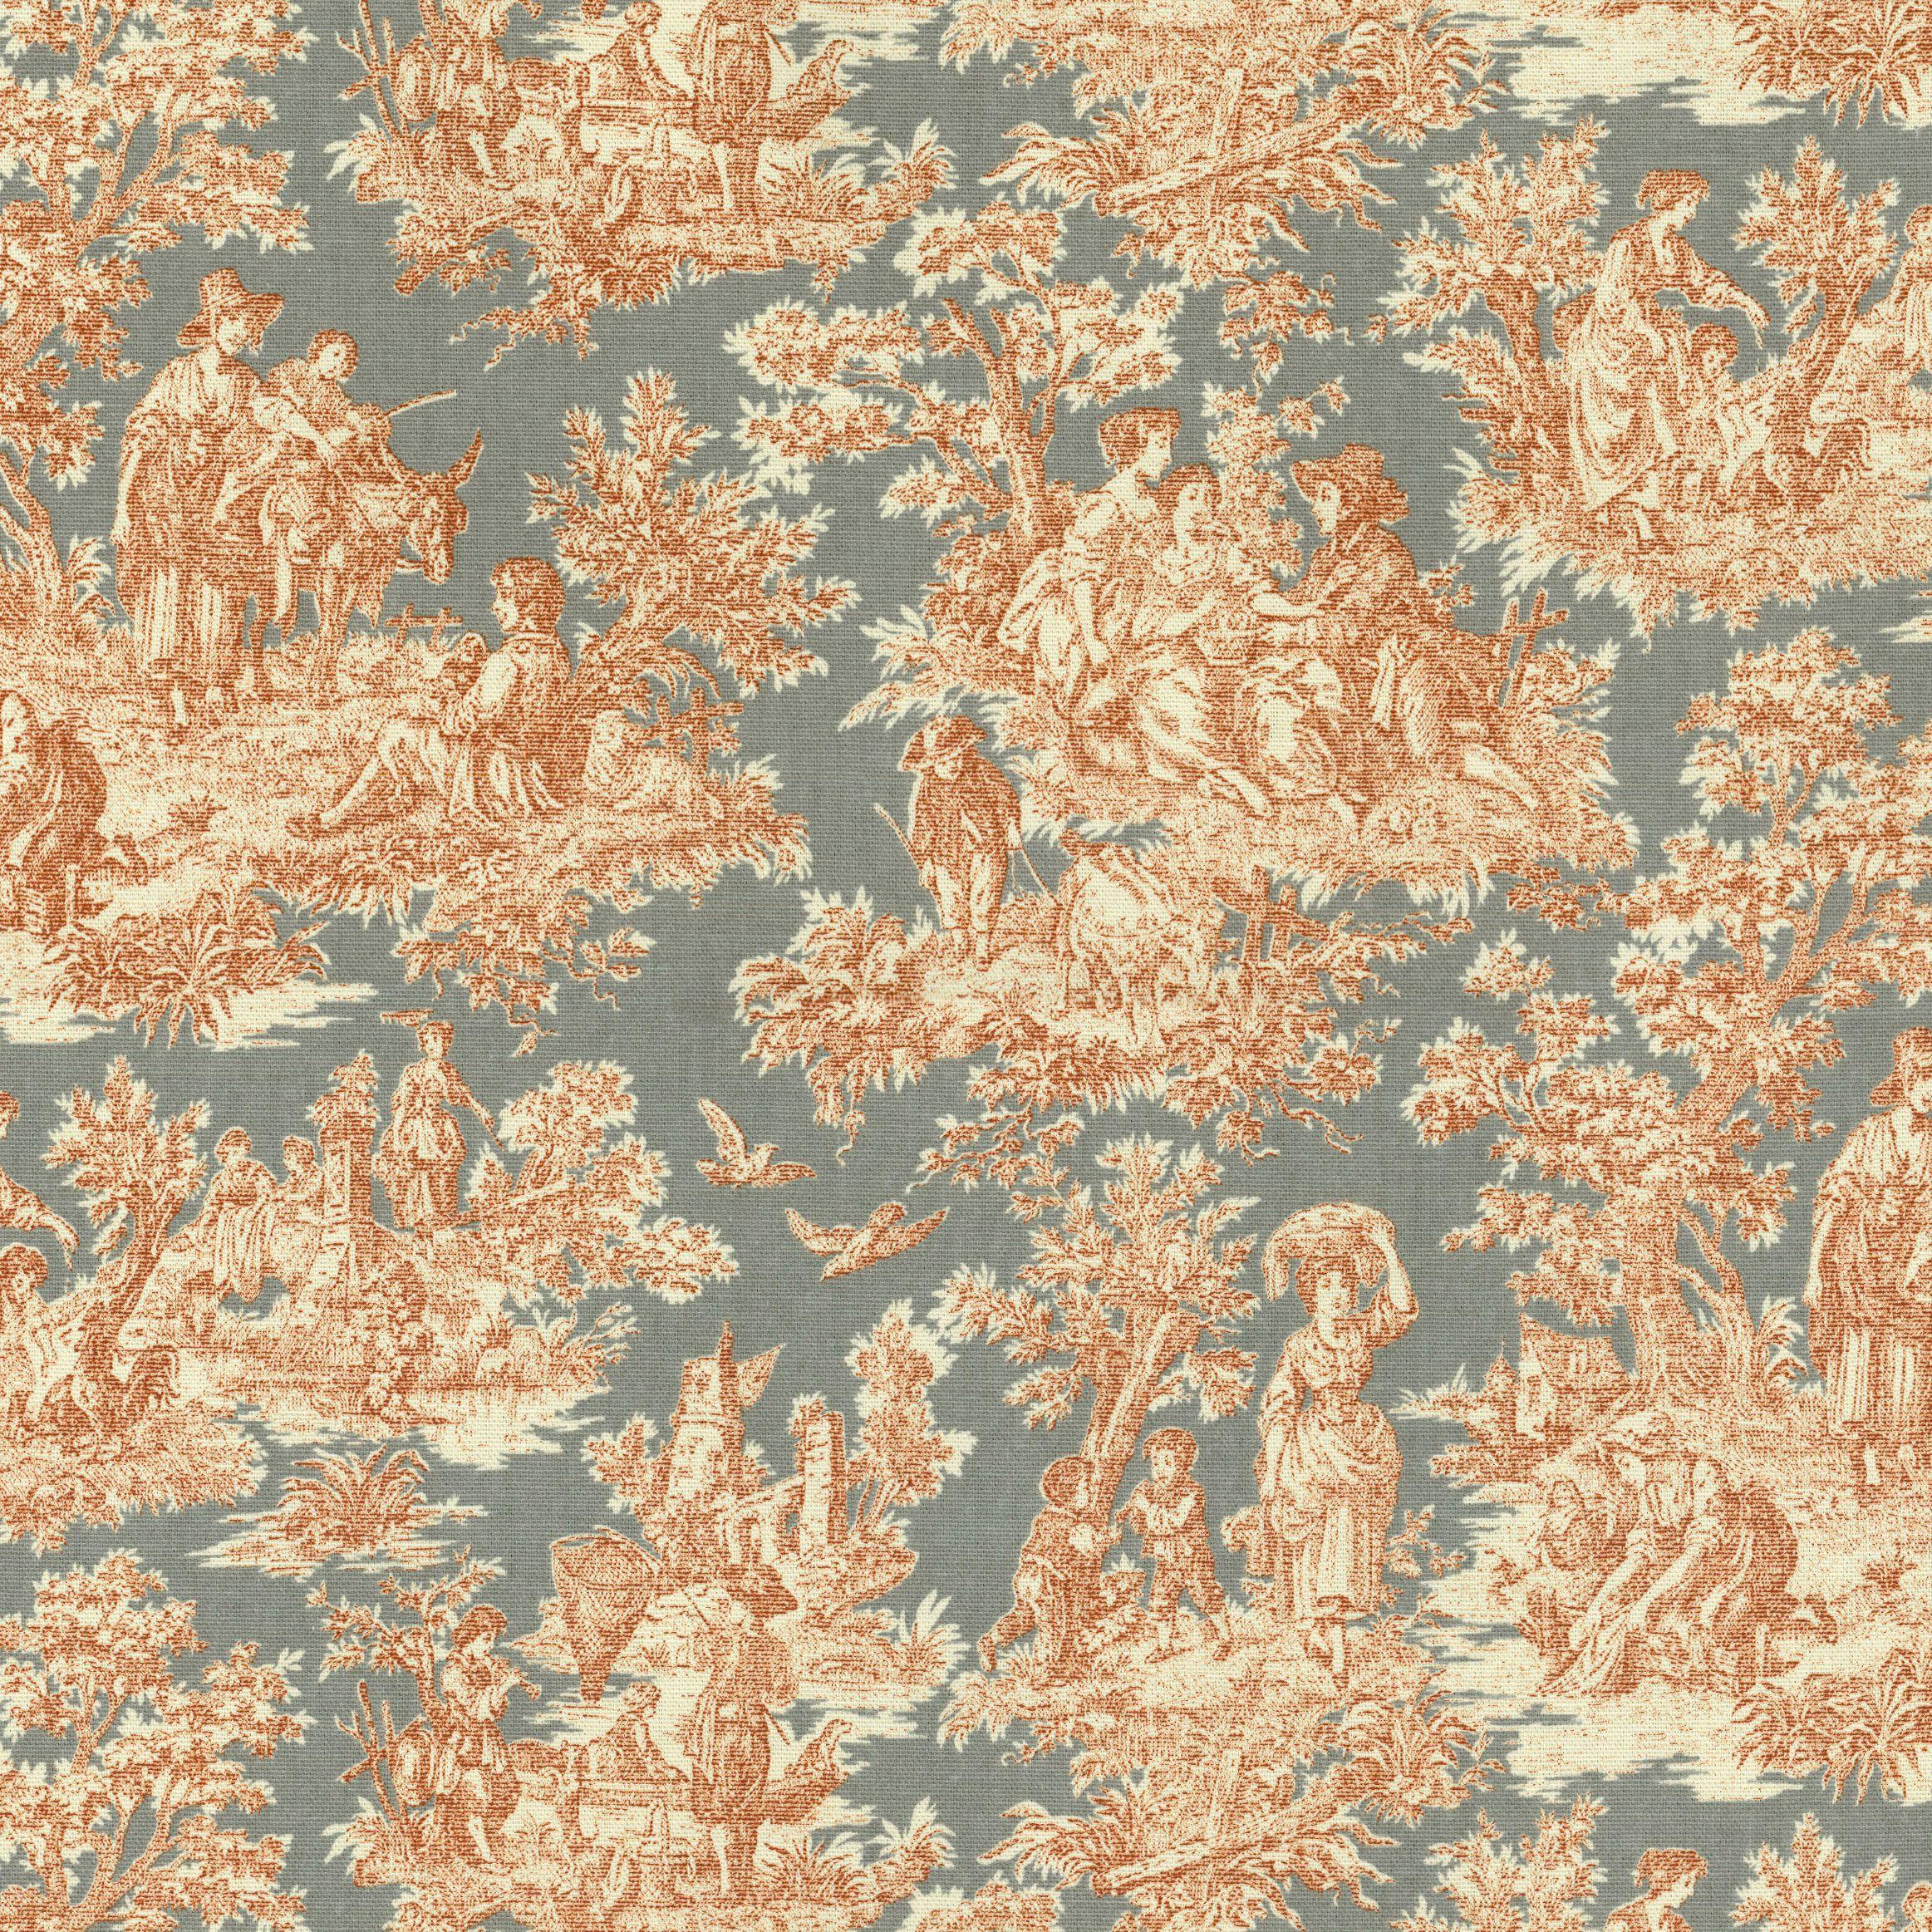 Home Decor Print Fabric Pkl Rustic Life Terracottahome Decor Print